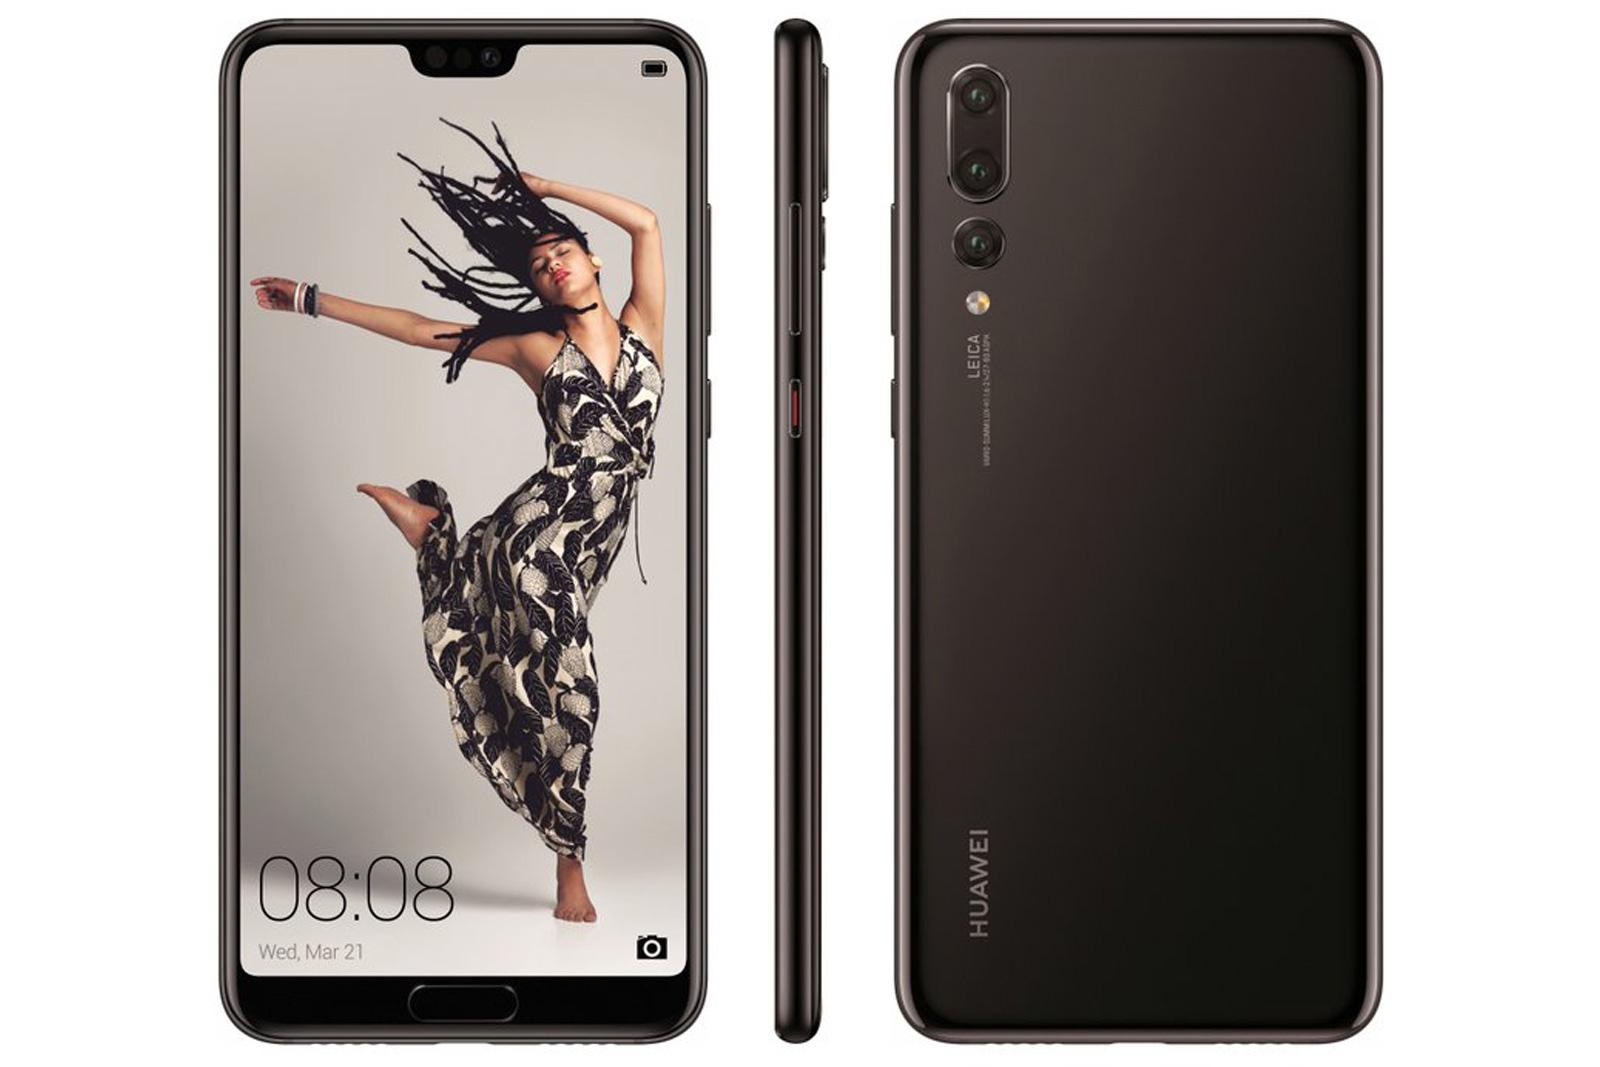 Huawei P20 lite (2018)